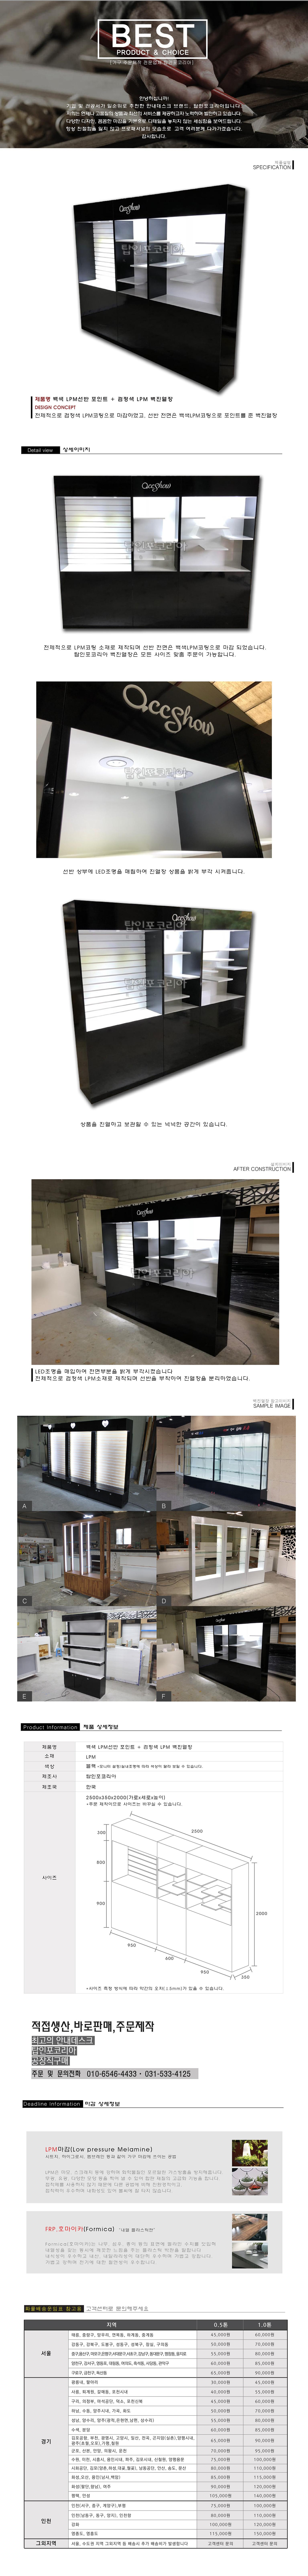 No9-선반-전면-호마이카-마감-+-백색-LPM-벽진열장-01.jpg